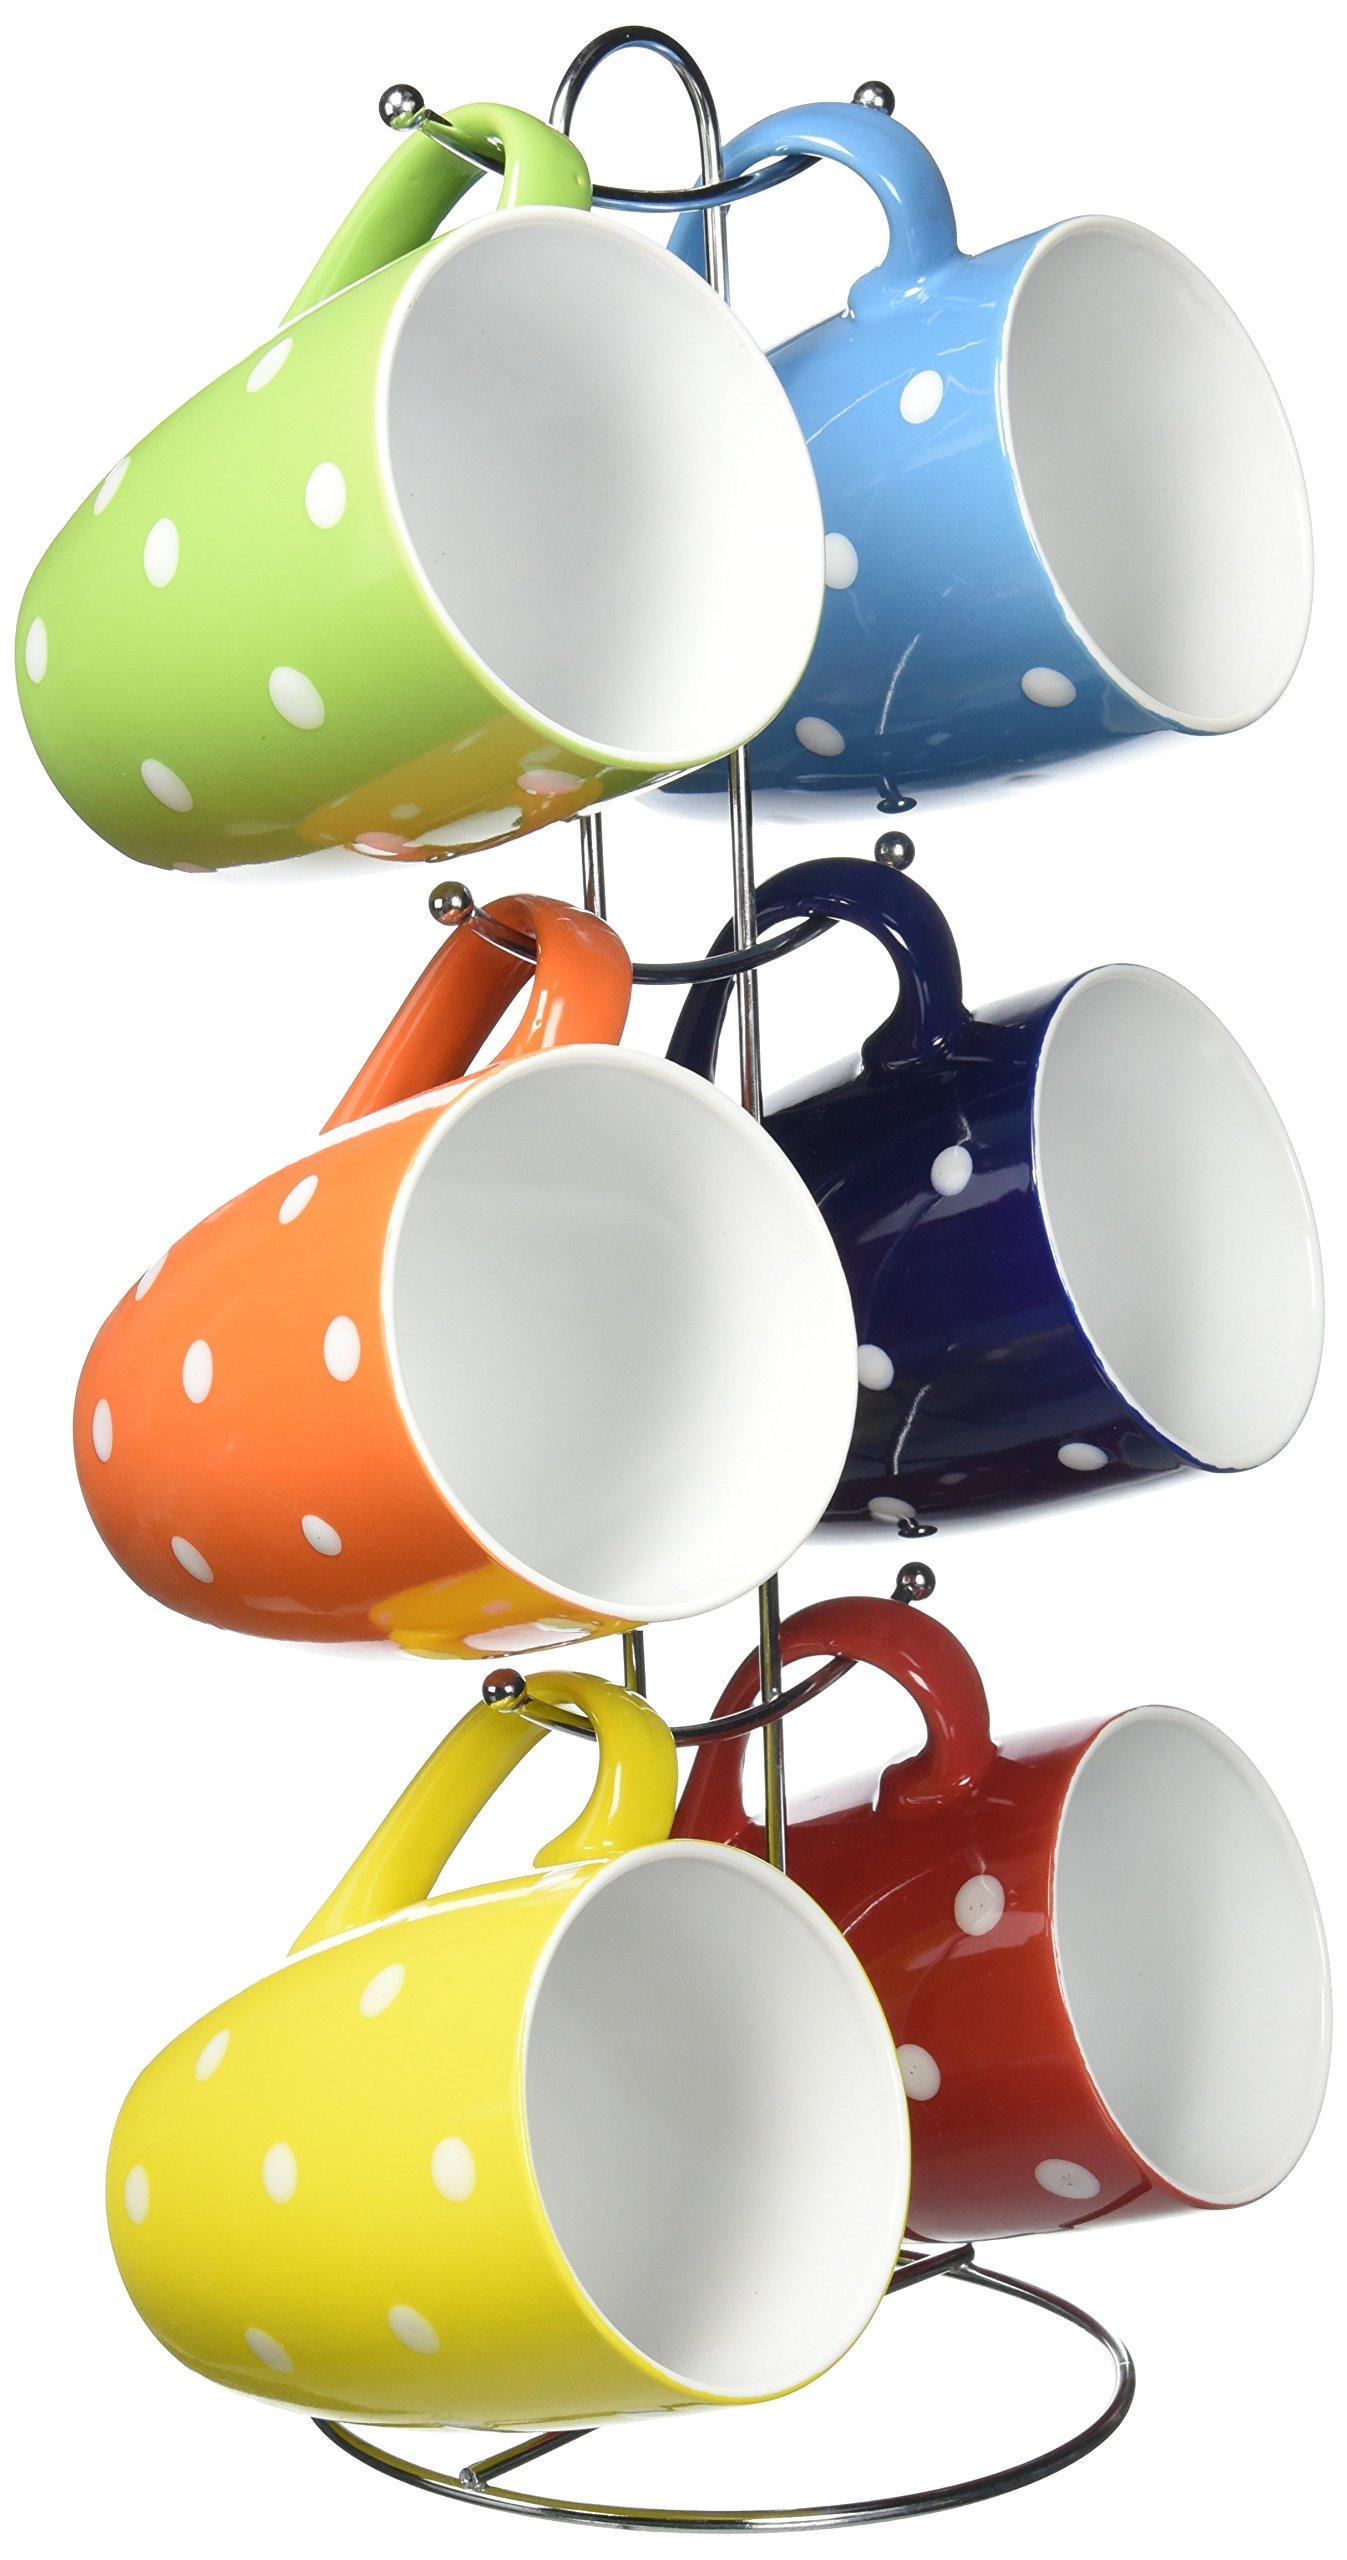 Uniware 11 Oz Bone China Porcelain Mug, Set of 6 with Stainless Steel Stand & Gift Box